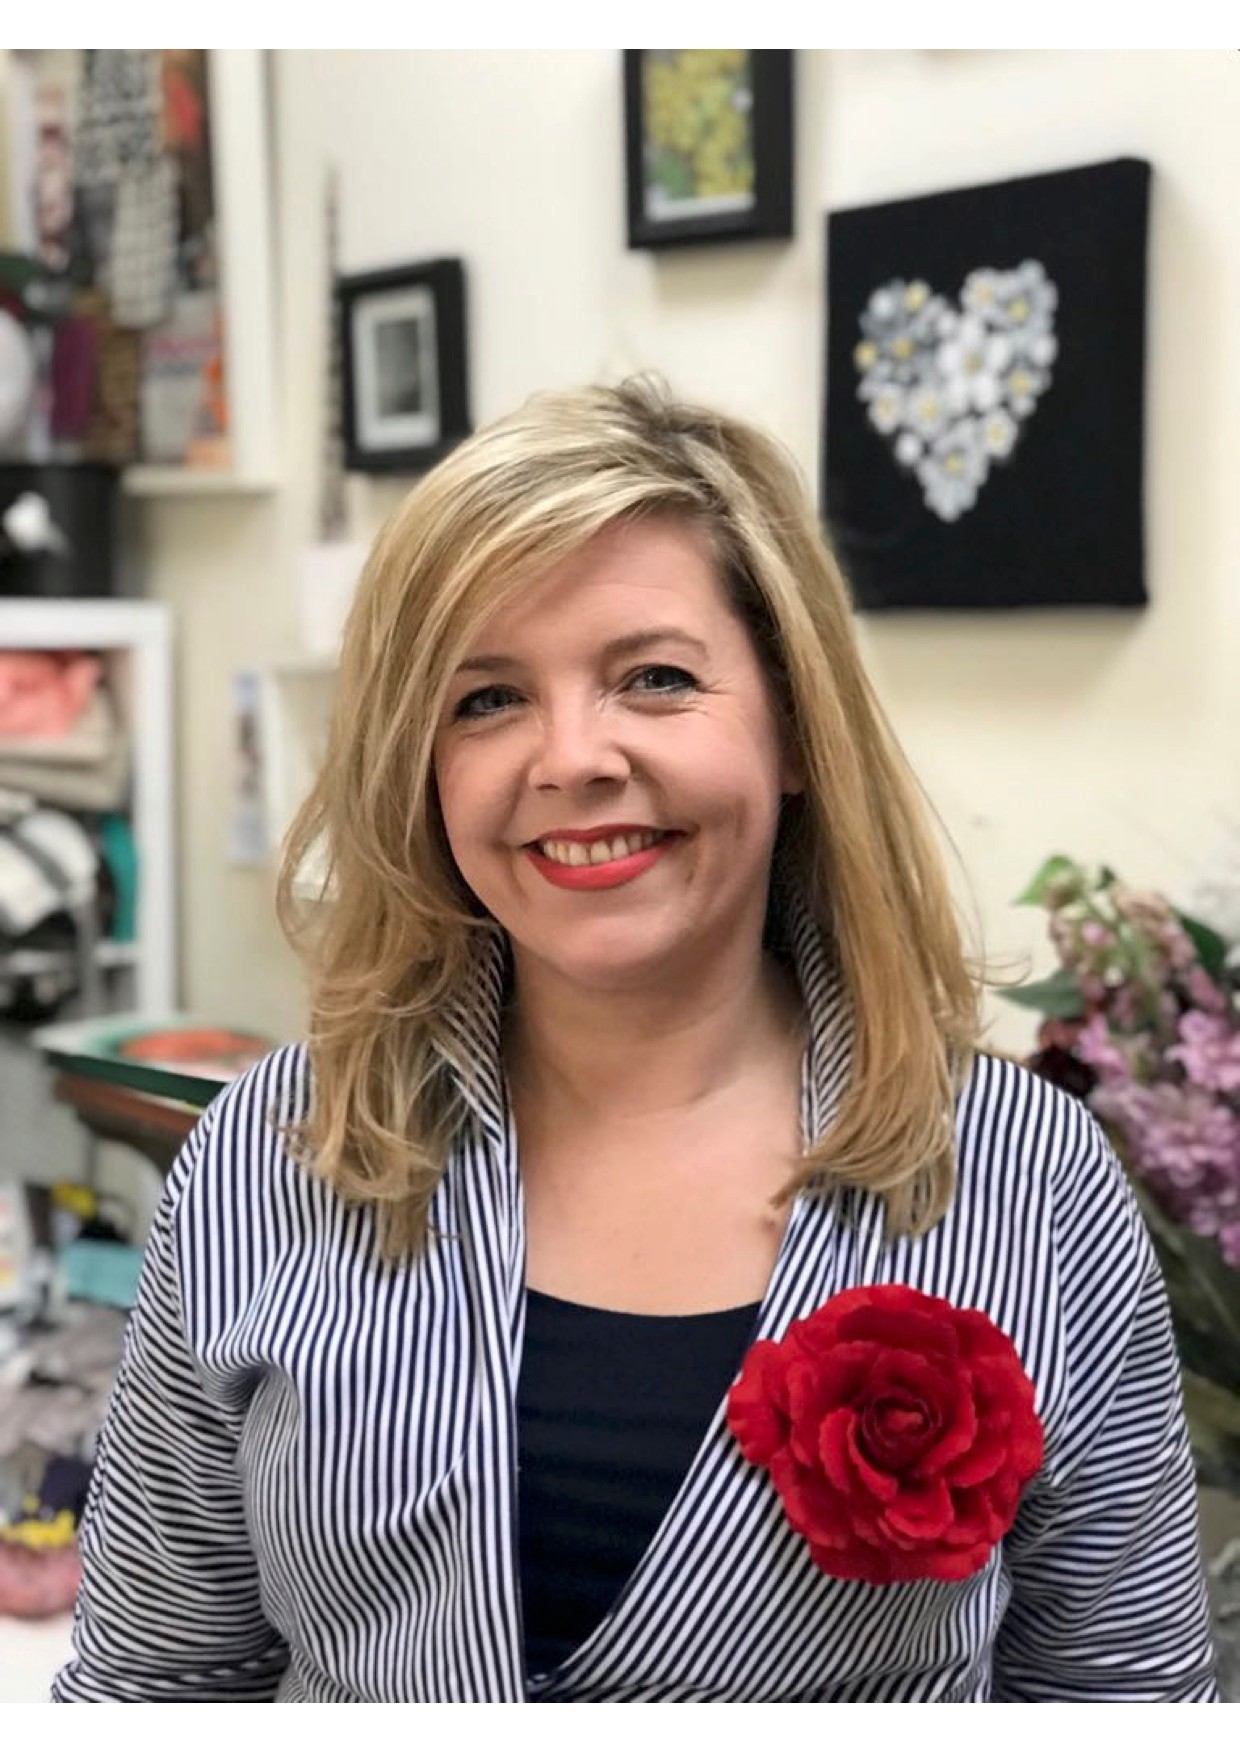 Marketing Publicity Photo Headshot of me Stacey taken by Jayne in her studio Ragley 2018